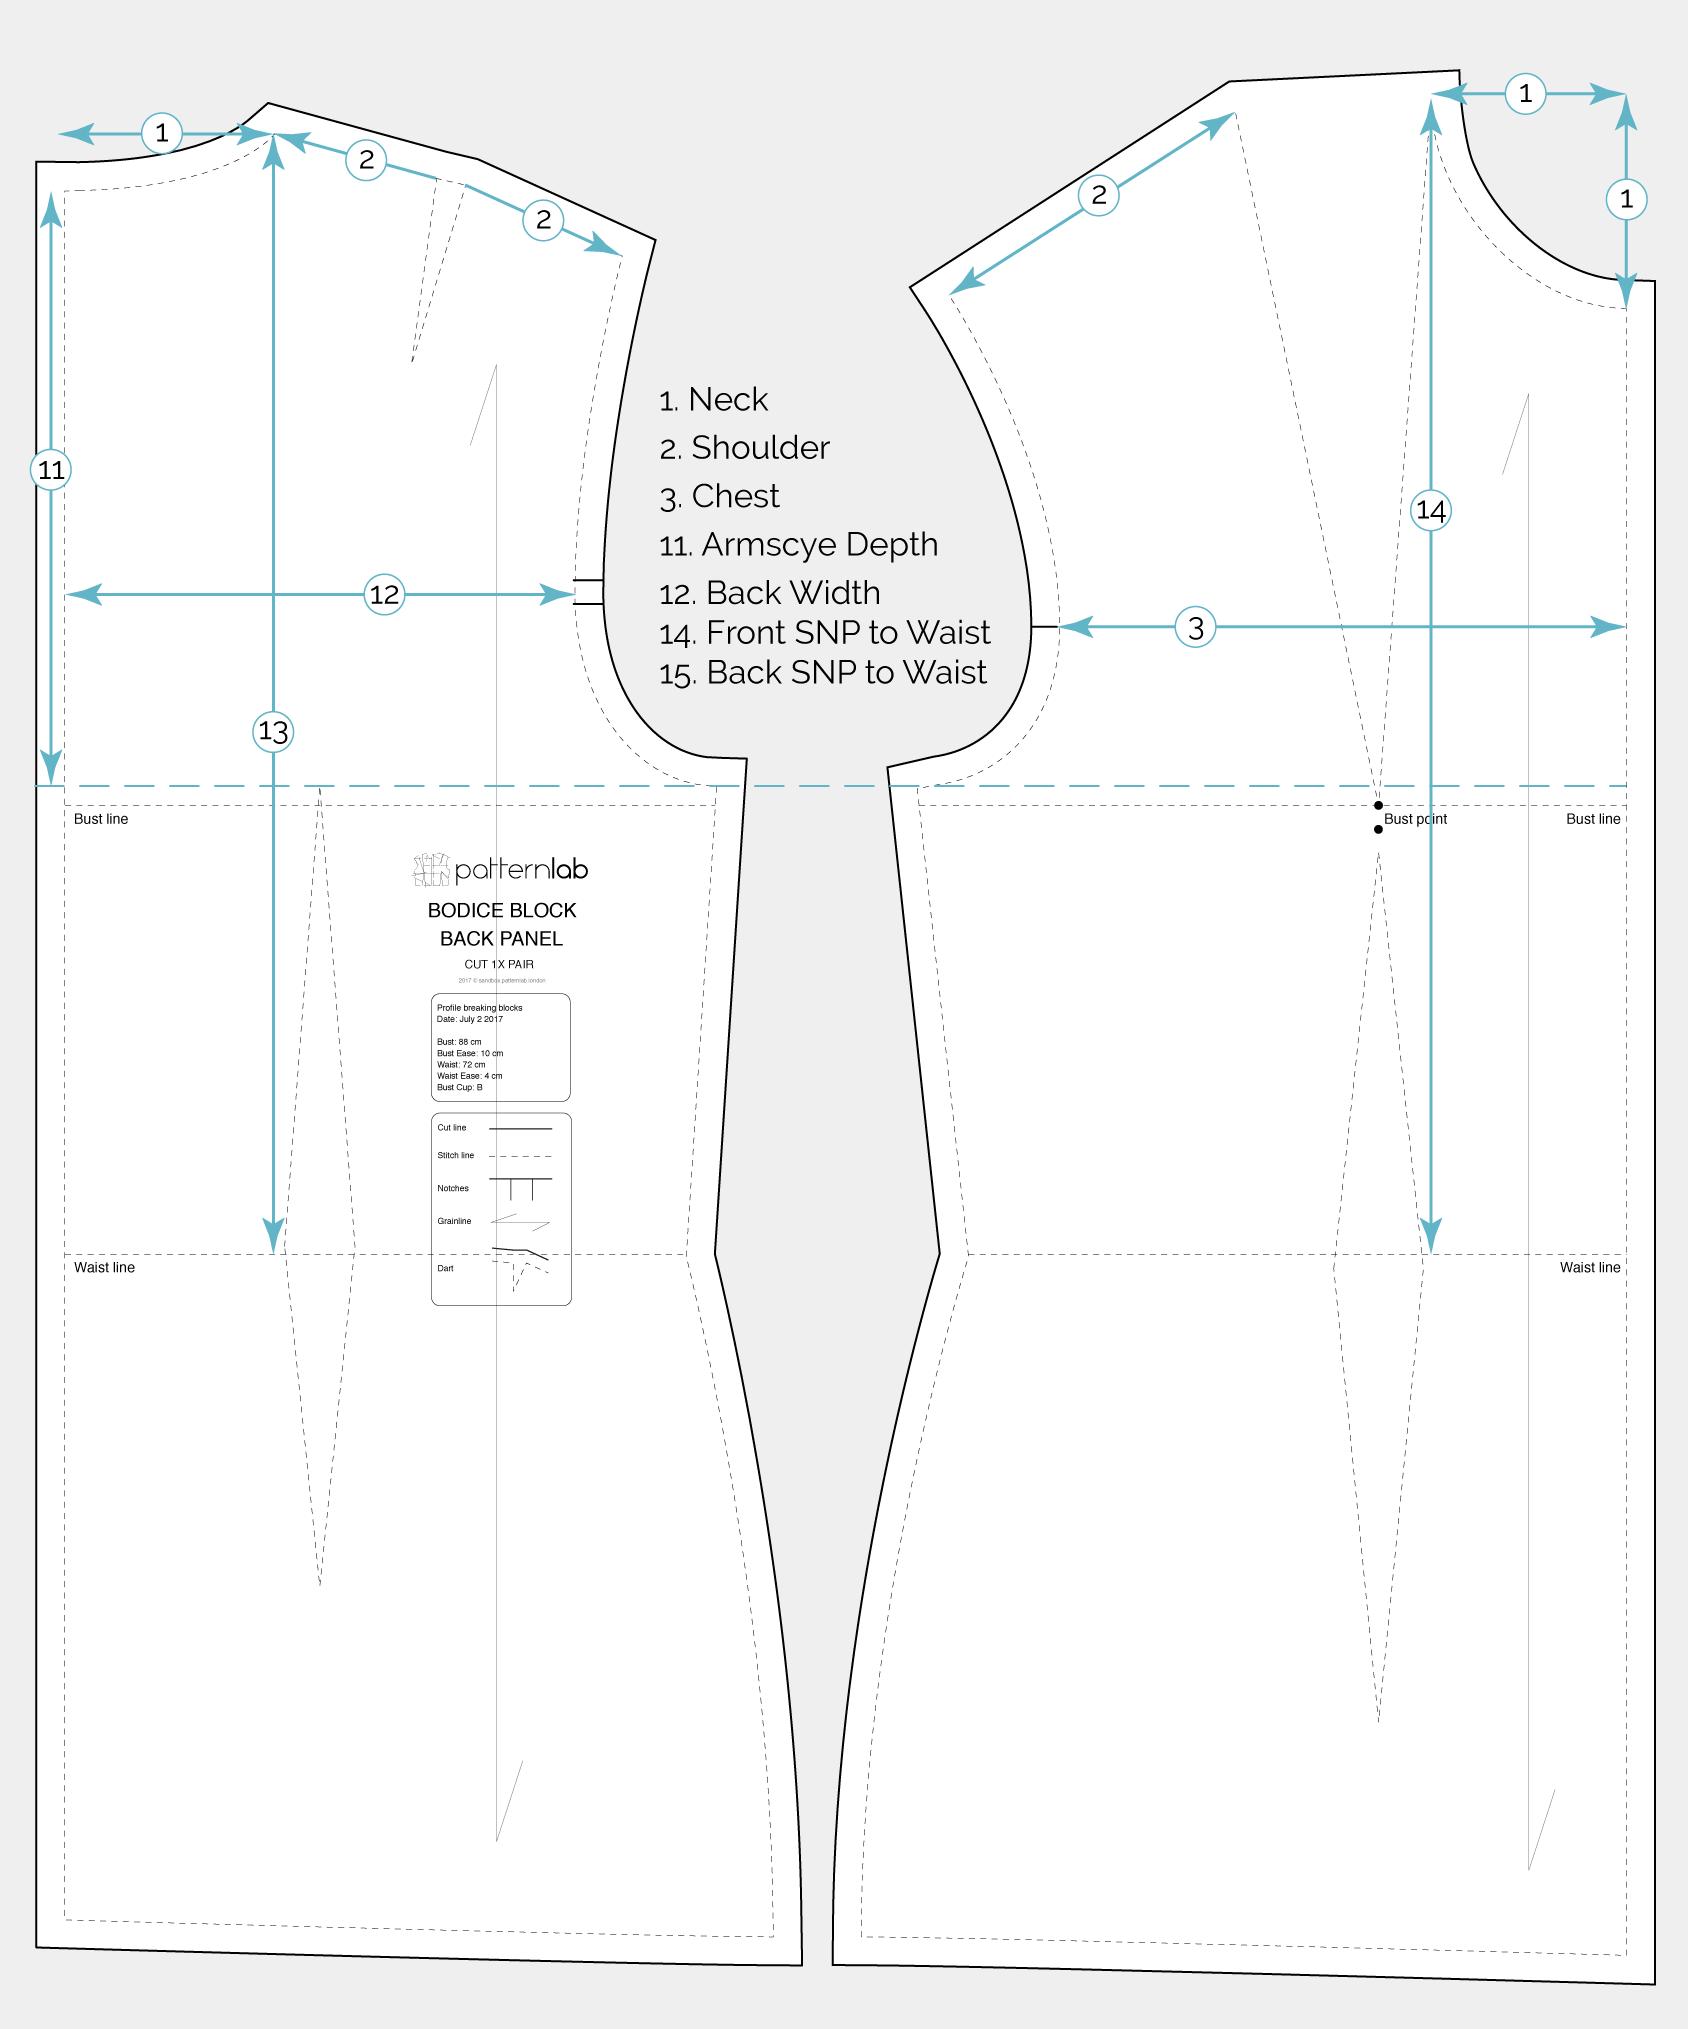 Basic torso block measurements - Patternlab